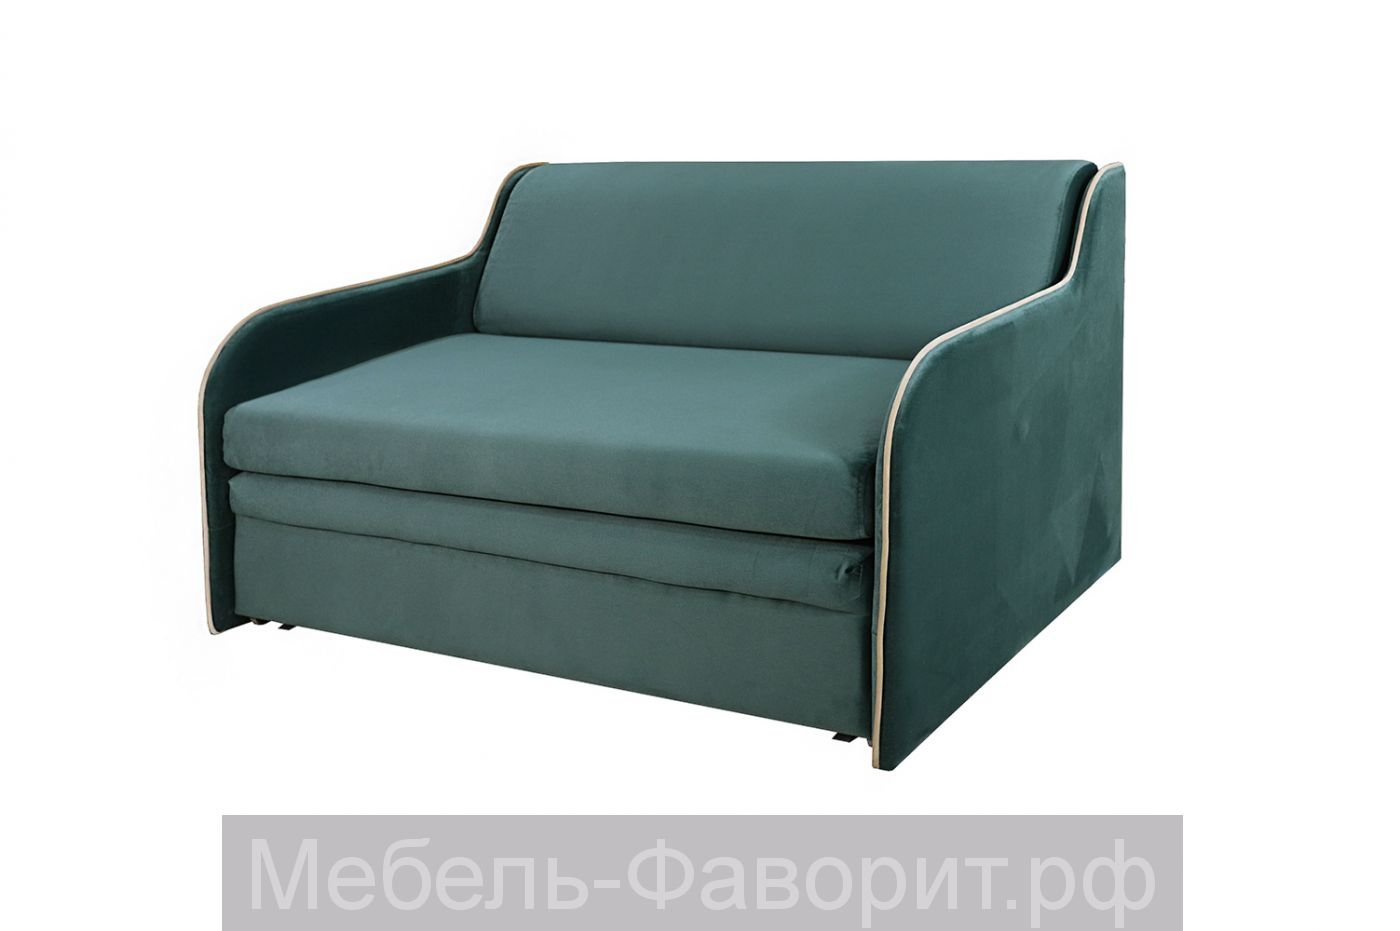 Легги_2 (диван)